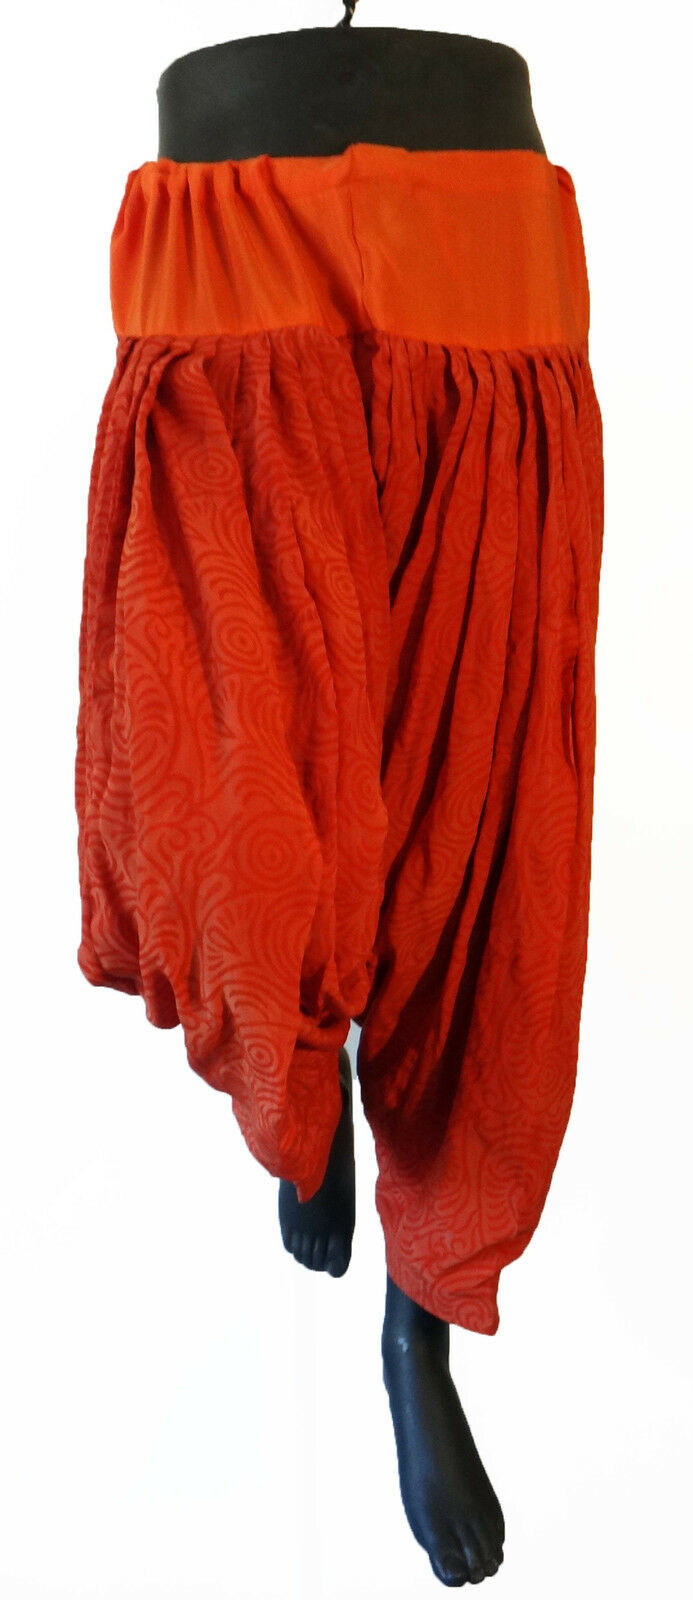 India Harem traditional genie aladin parkour yoga baggy pant orange Salwar